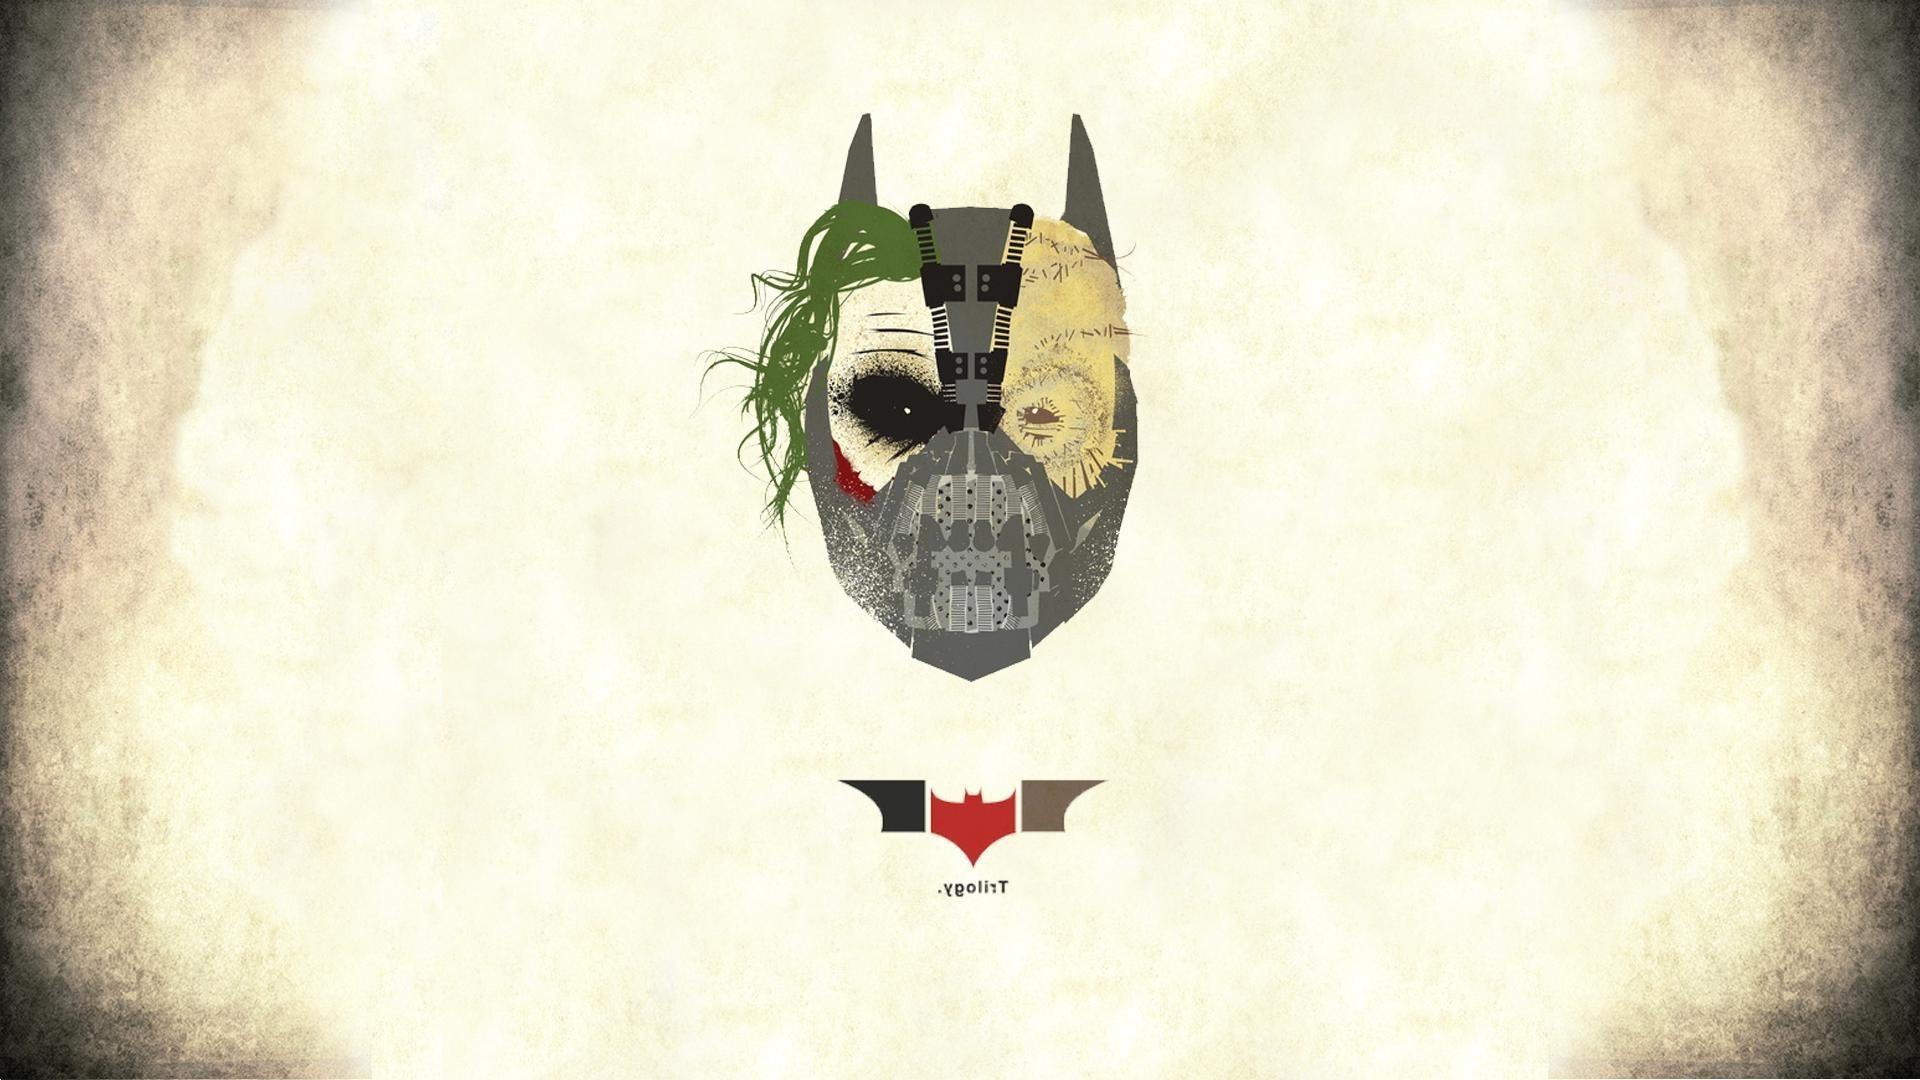 Wallpaper 1920x1080 Px Bane Batman Logo Mask The Dark Knight